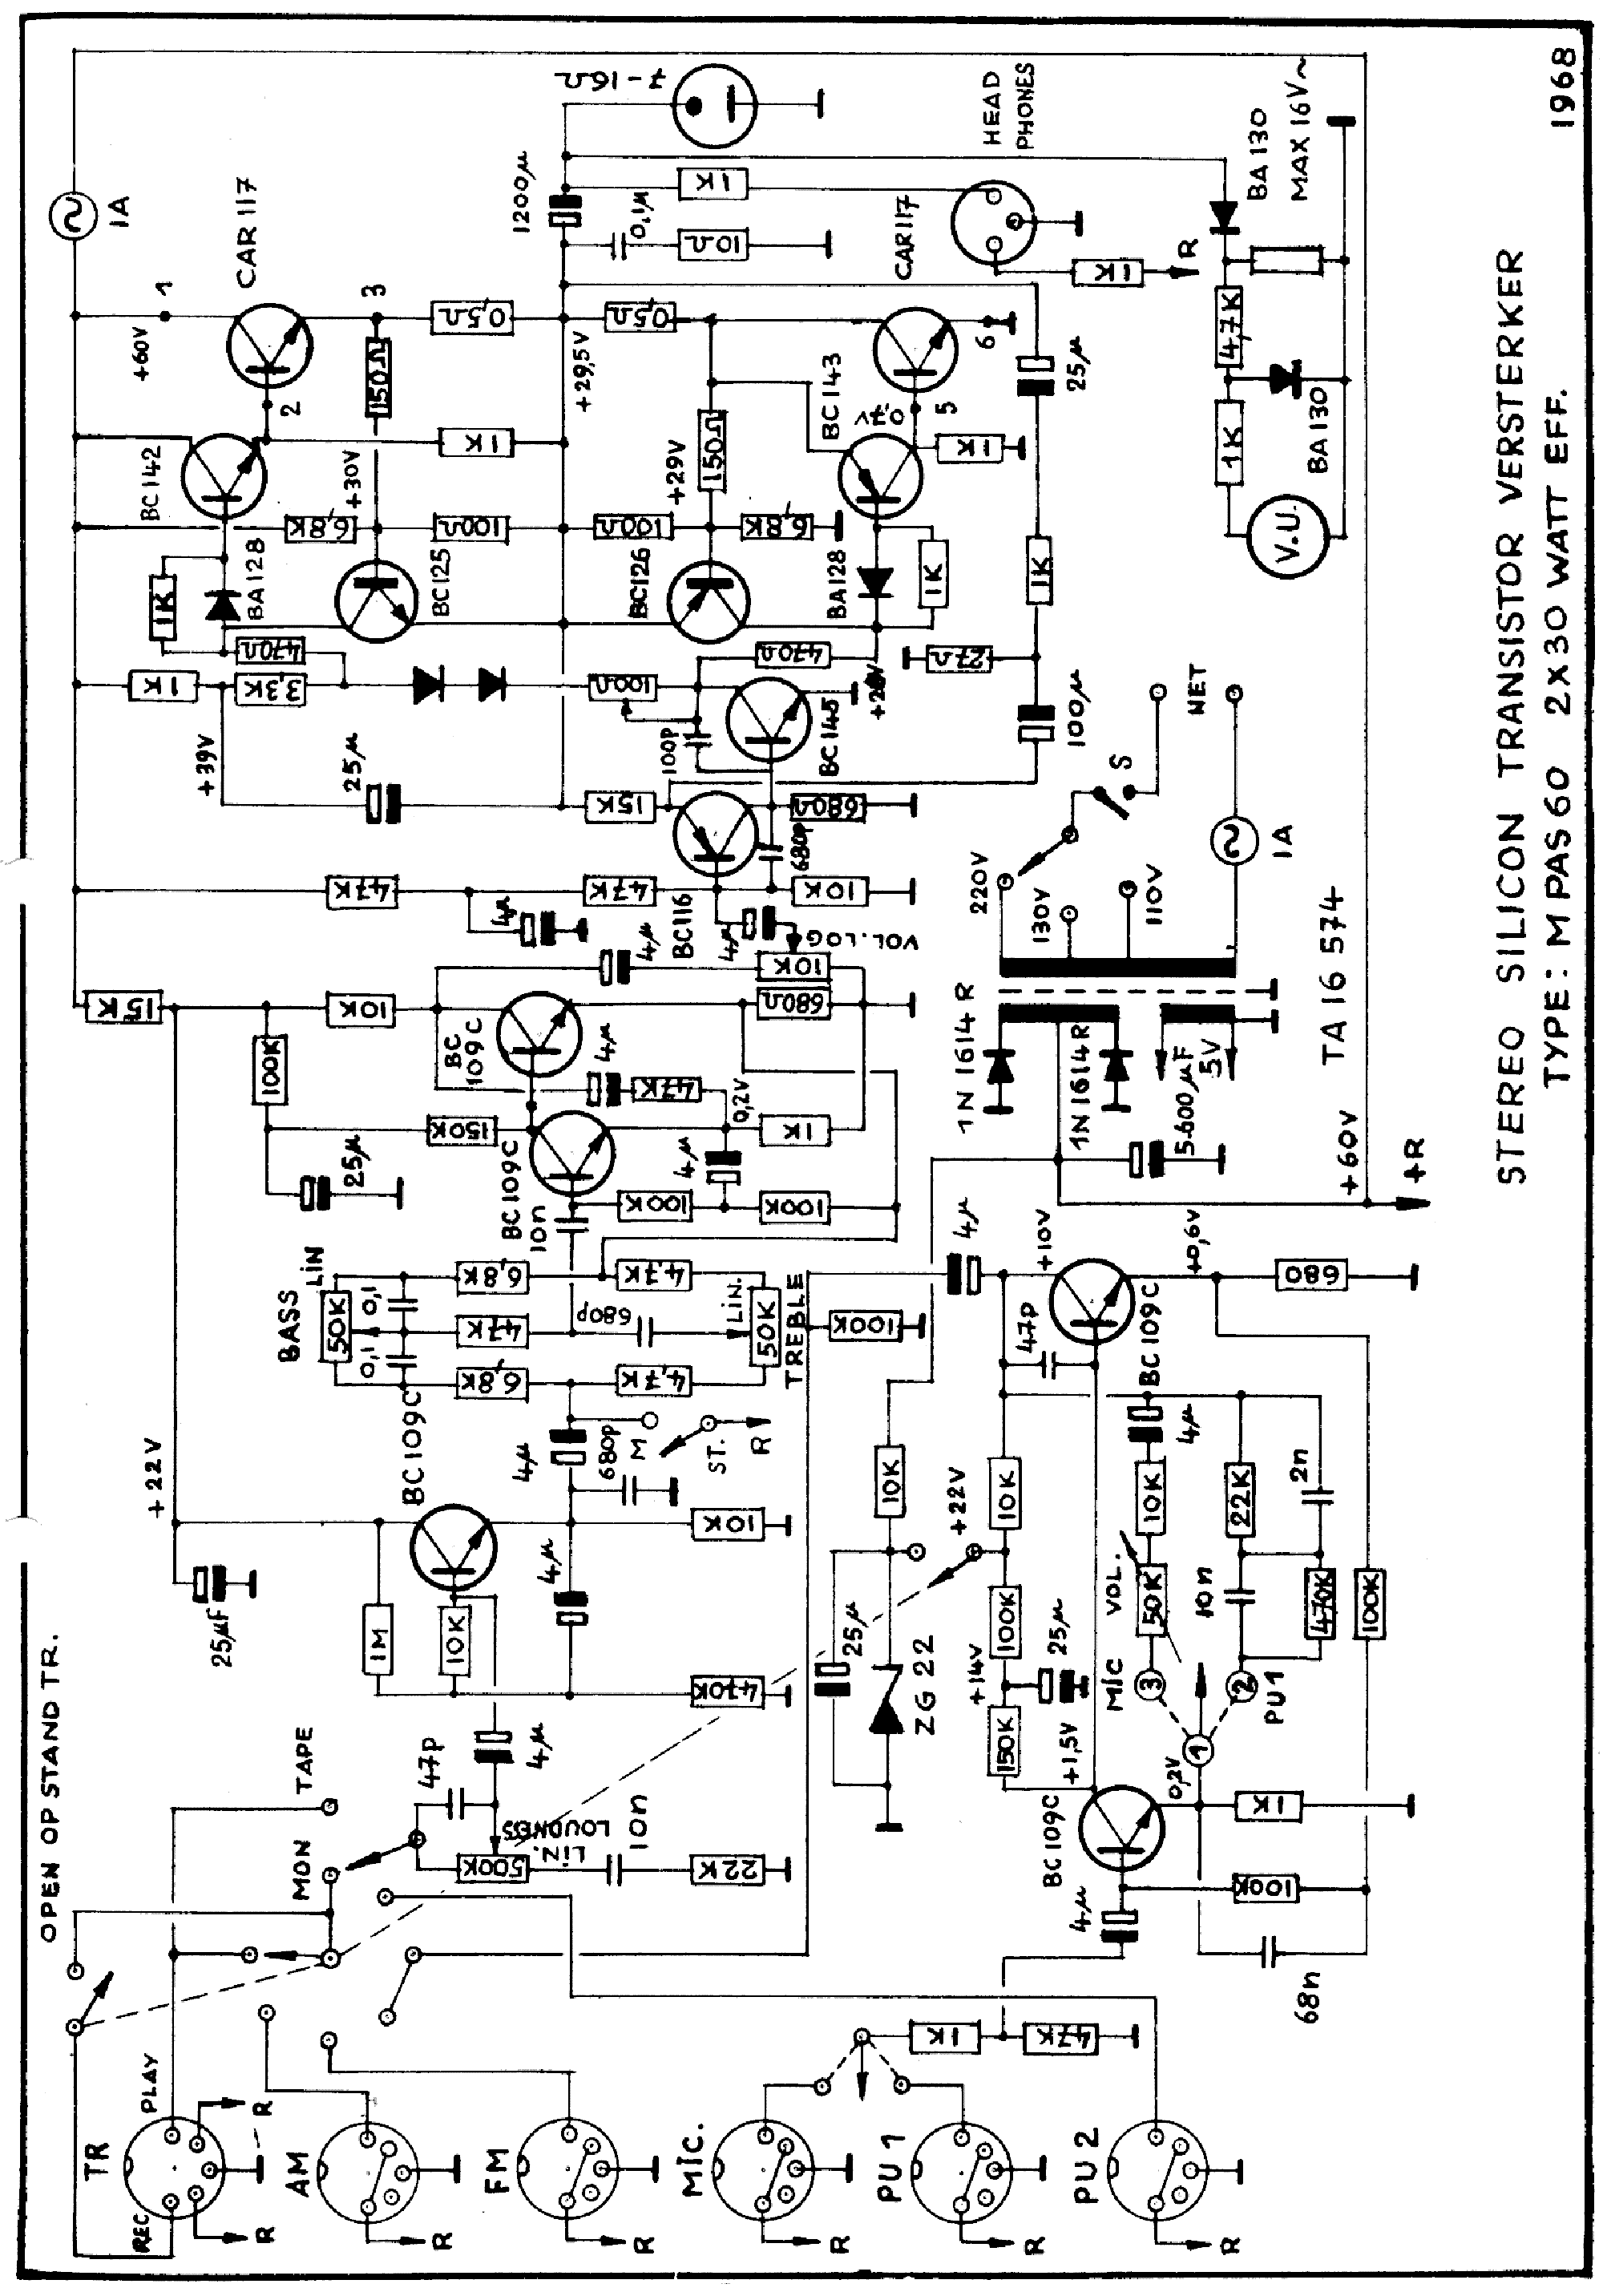 carad mpas60 2x30w stereo transistor amplifier sch service